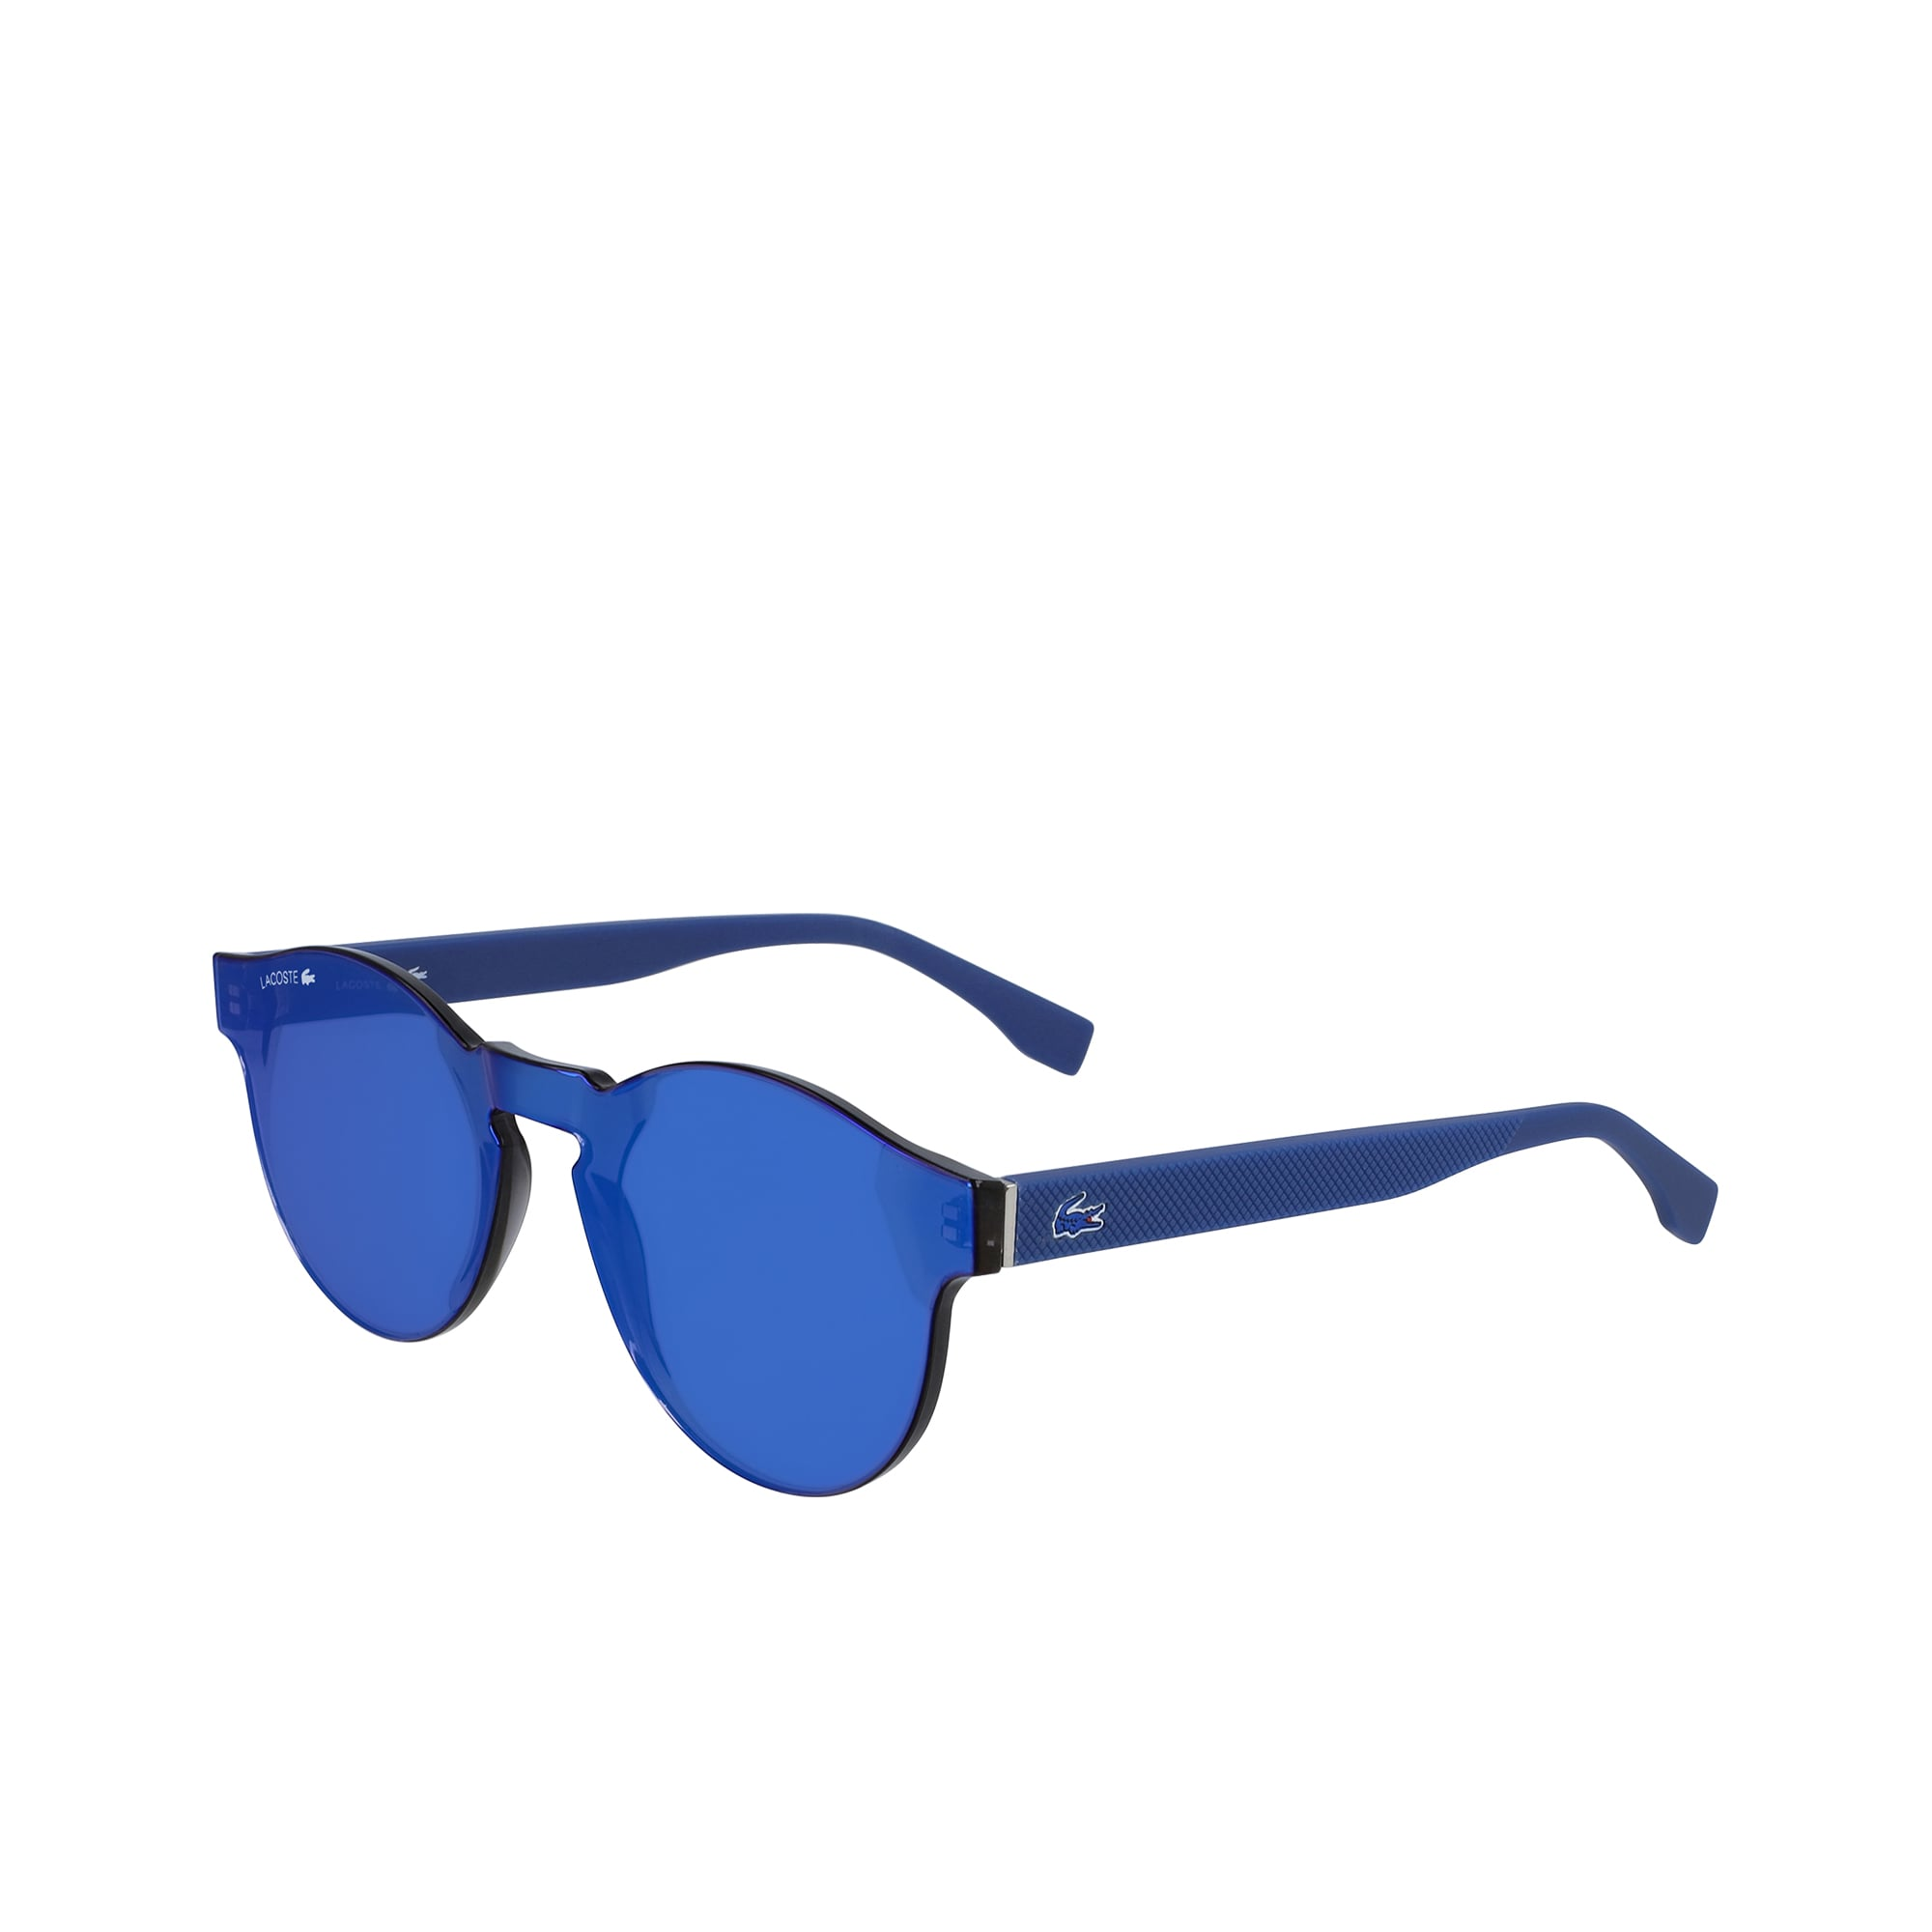 77b18ad0ec8 Sunglasses for men